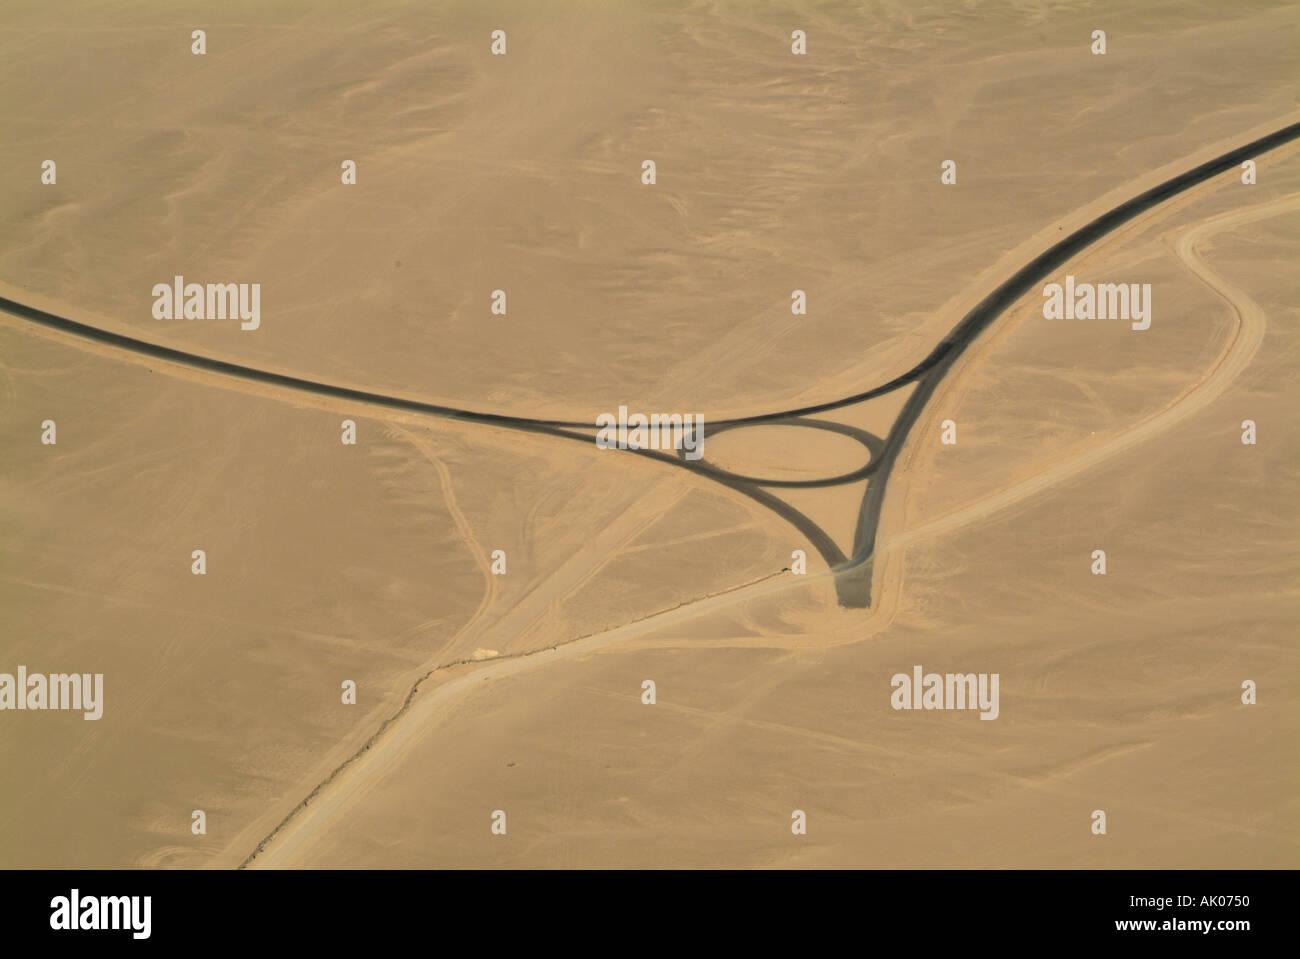 Road in the desert landscape Hurgada, Red Sea, Egypt - aerial view Stock Photo